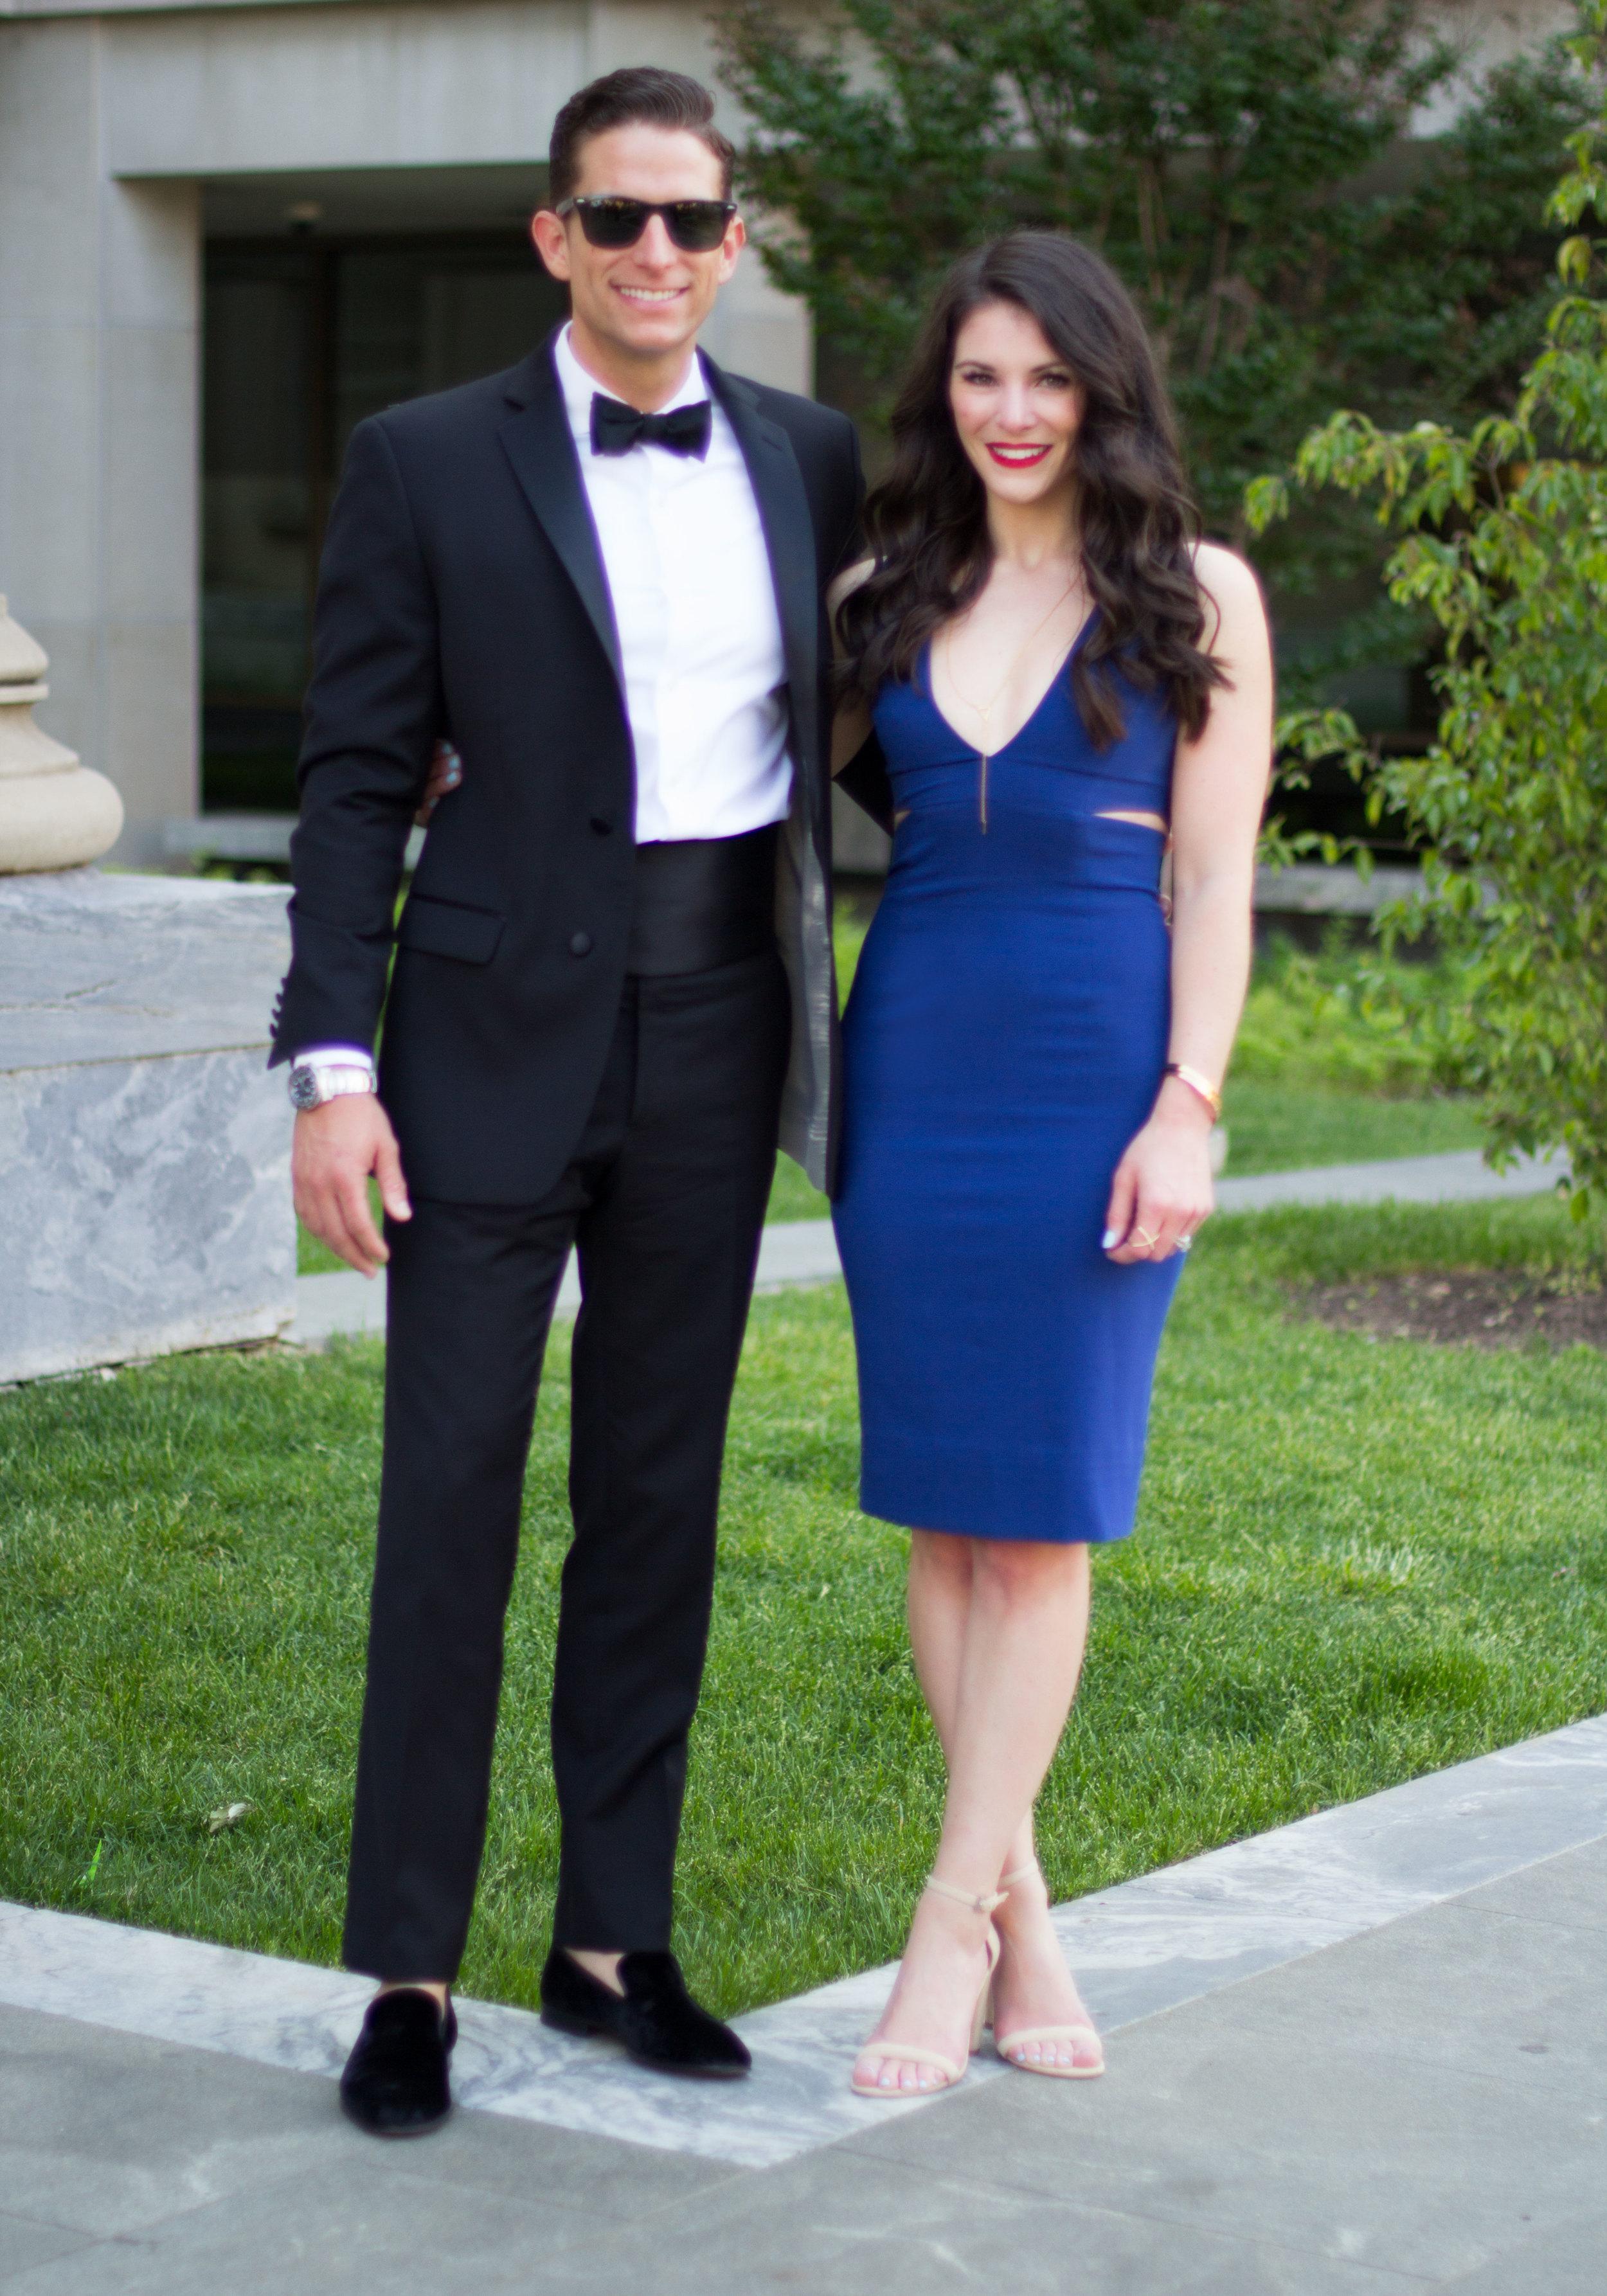 how to find the perfect wedding guest dress summer wedding guest dress What to wear to a summer wedding bodycon dress black tie wedding attire